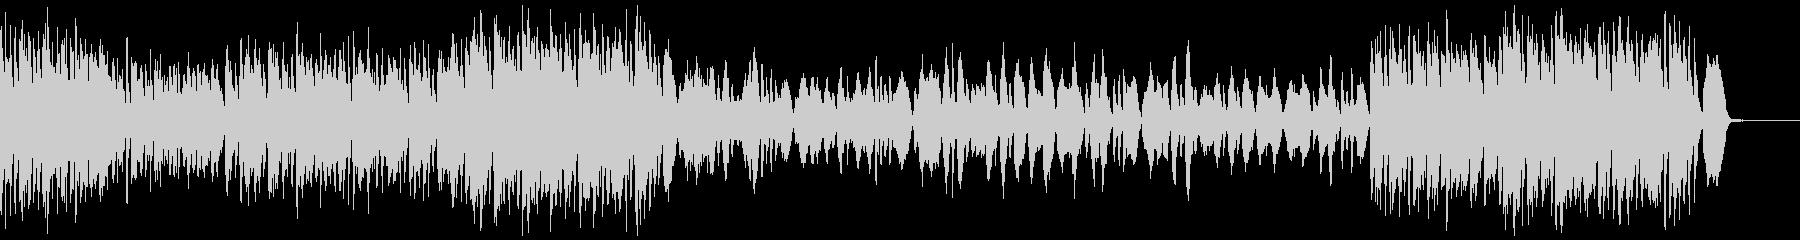 BWV1066/5『メヌエット』バッハの未再生の波形